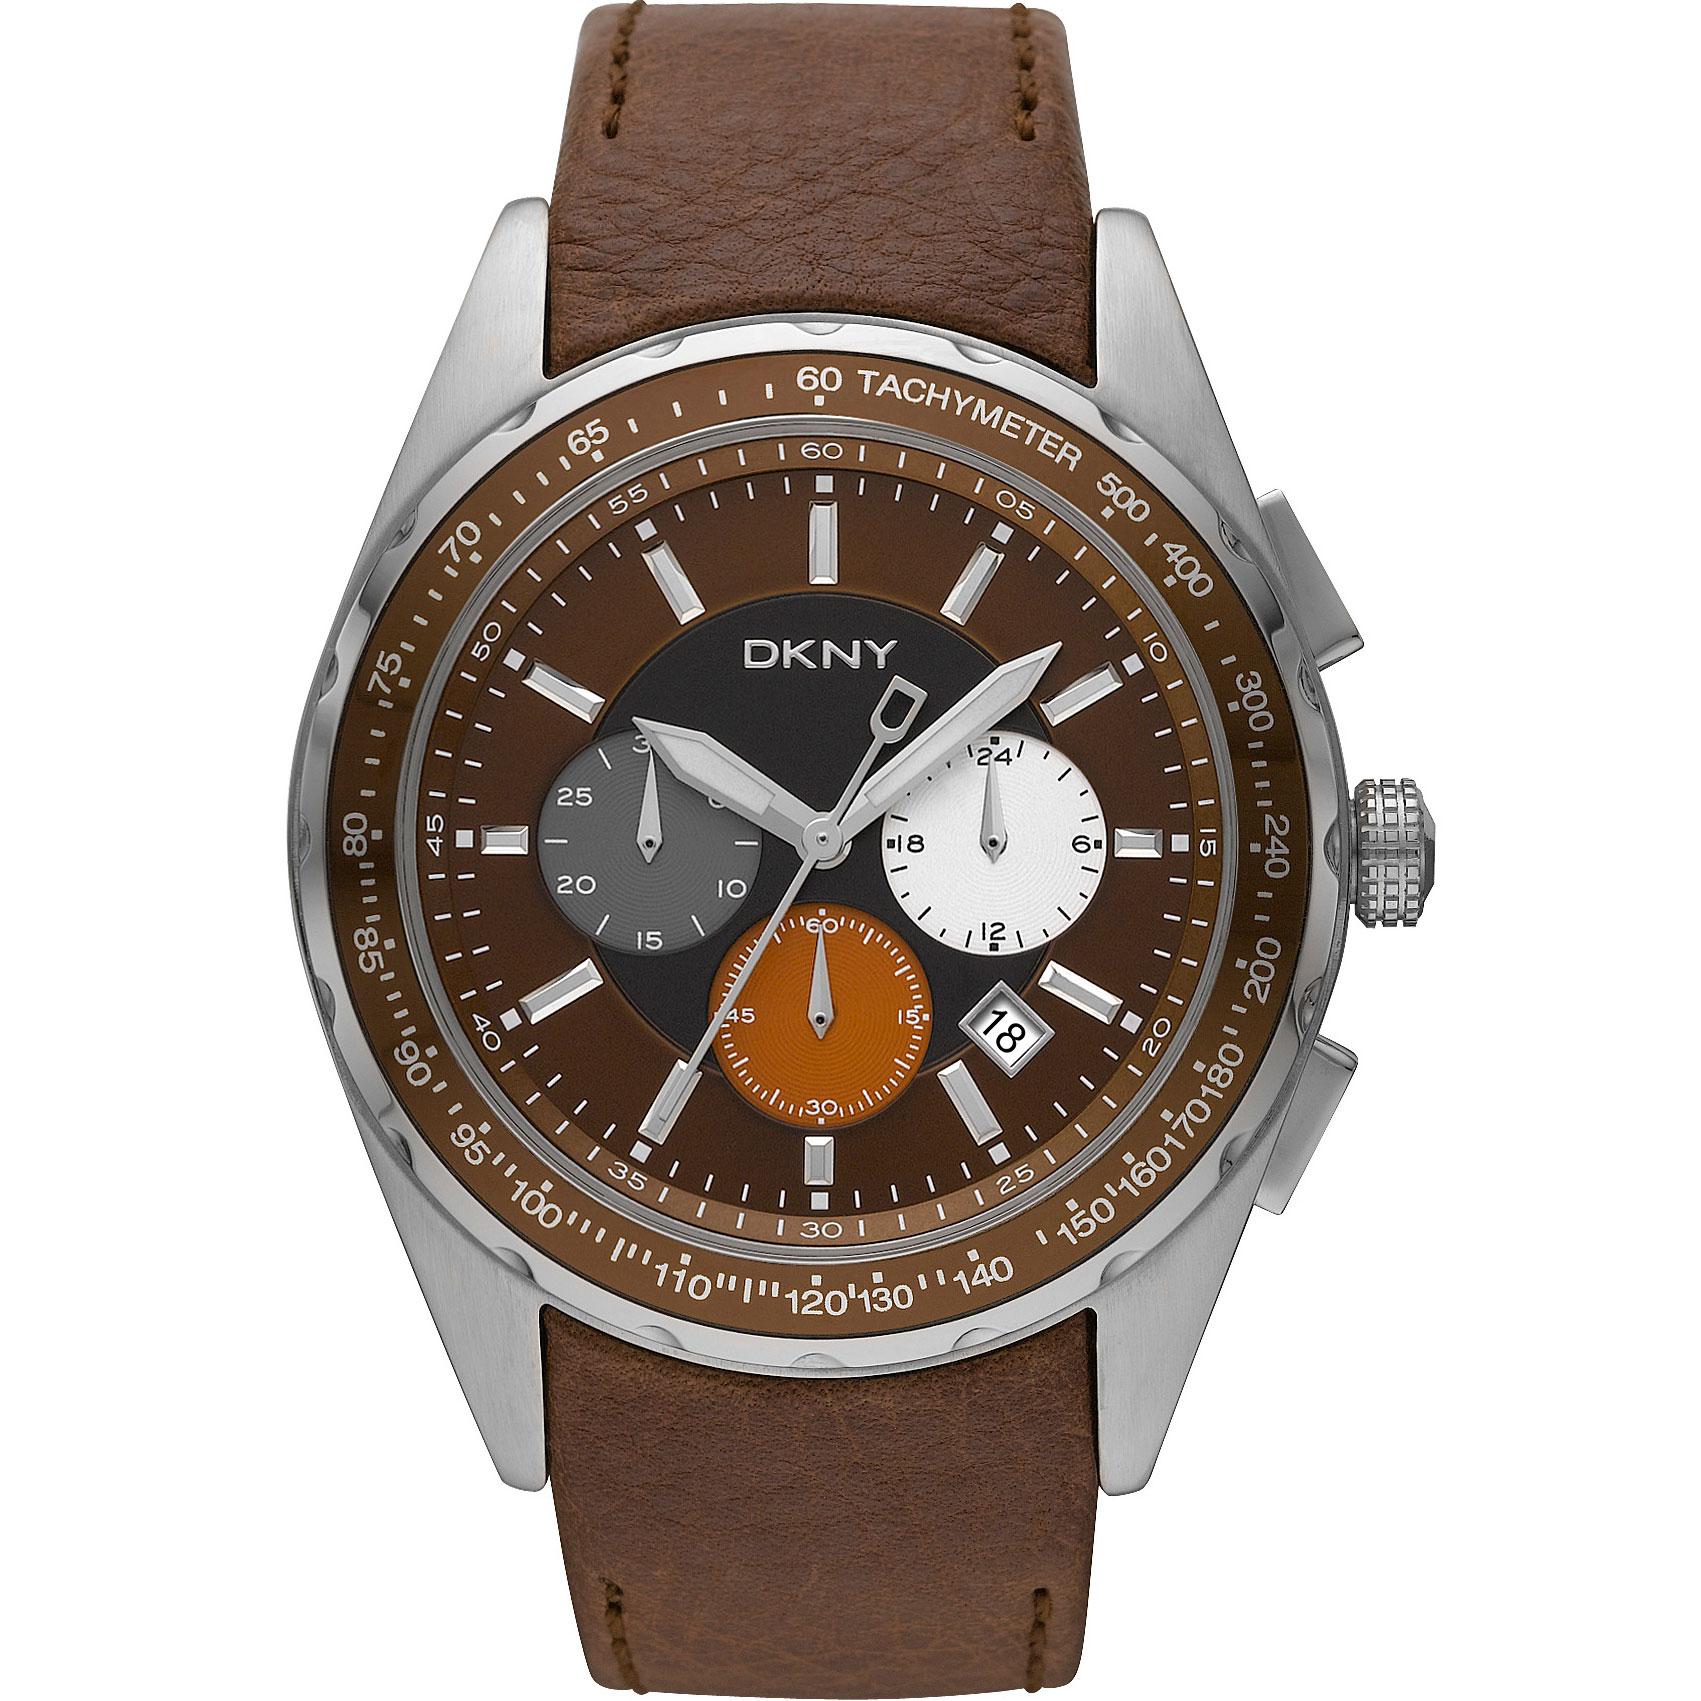 cb289d7fe Gents DKNY Chronograph Watch (NY1487) | WatchShop.com™